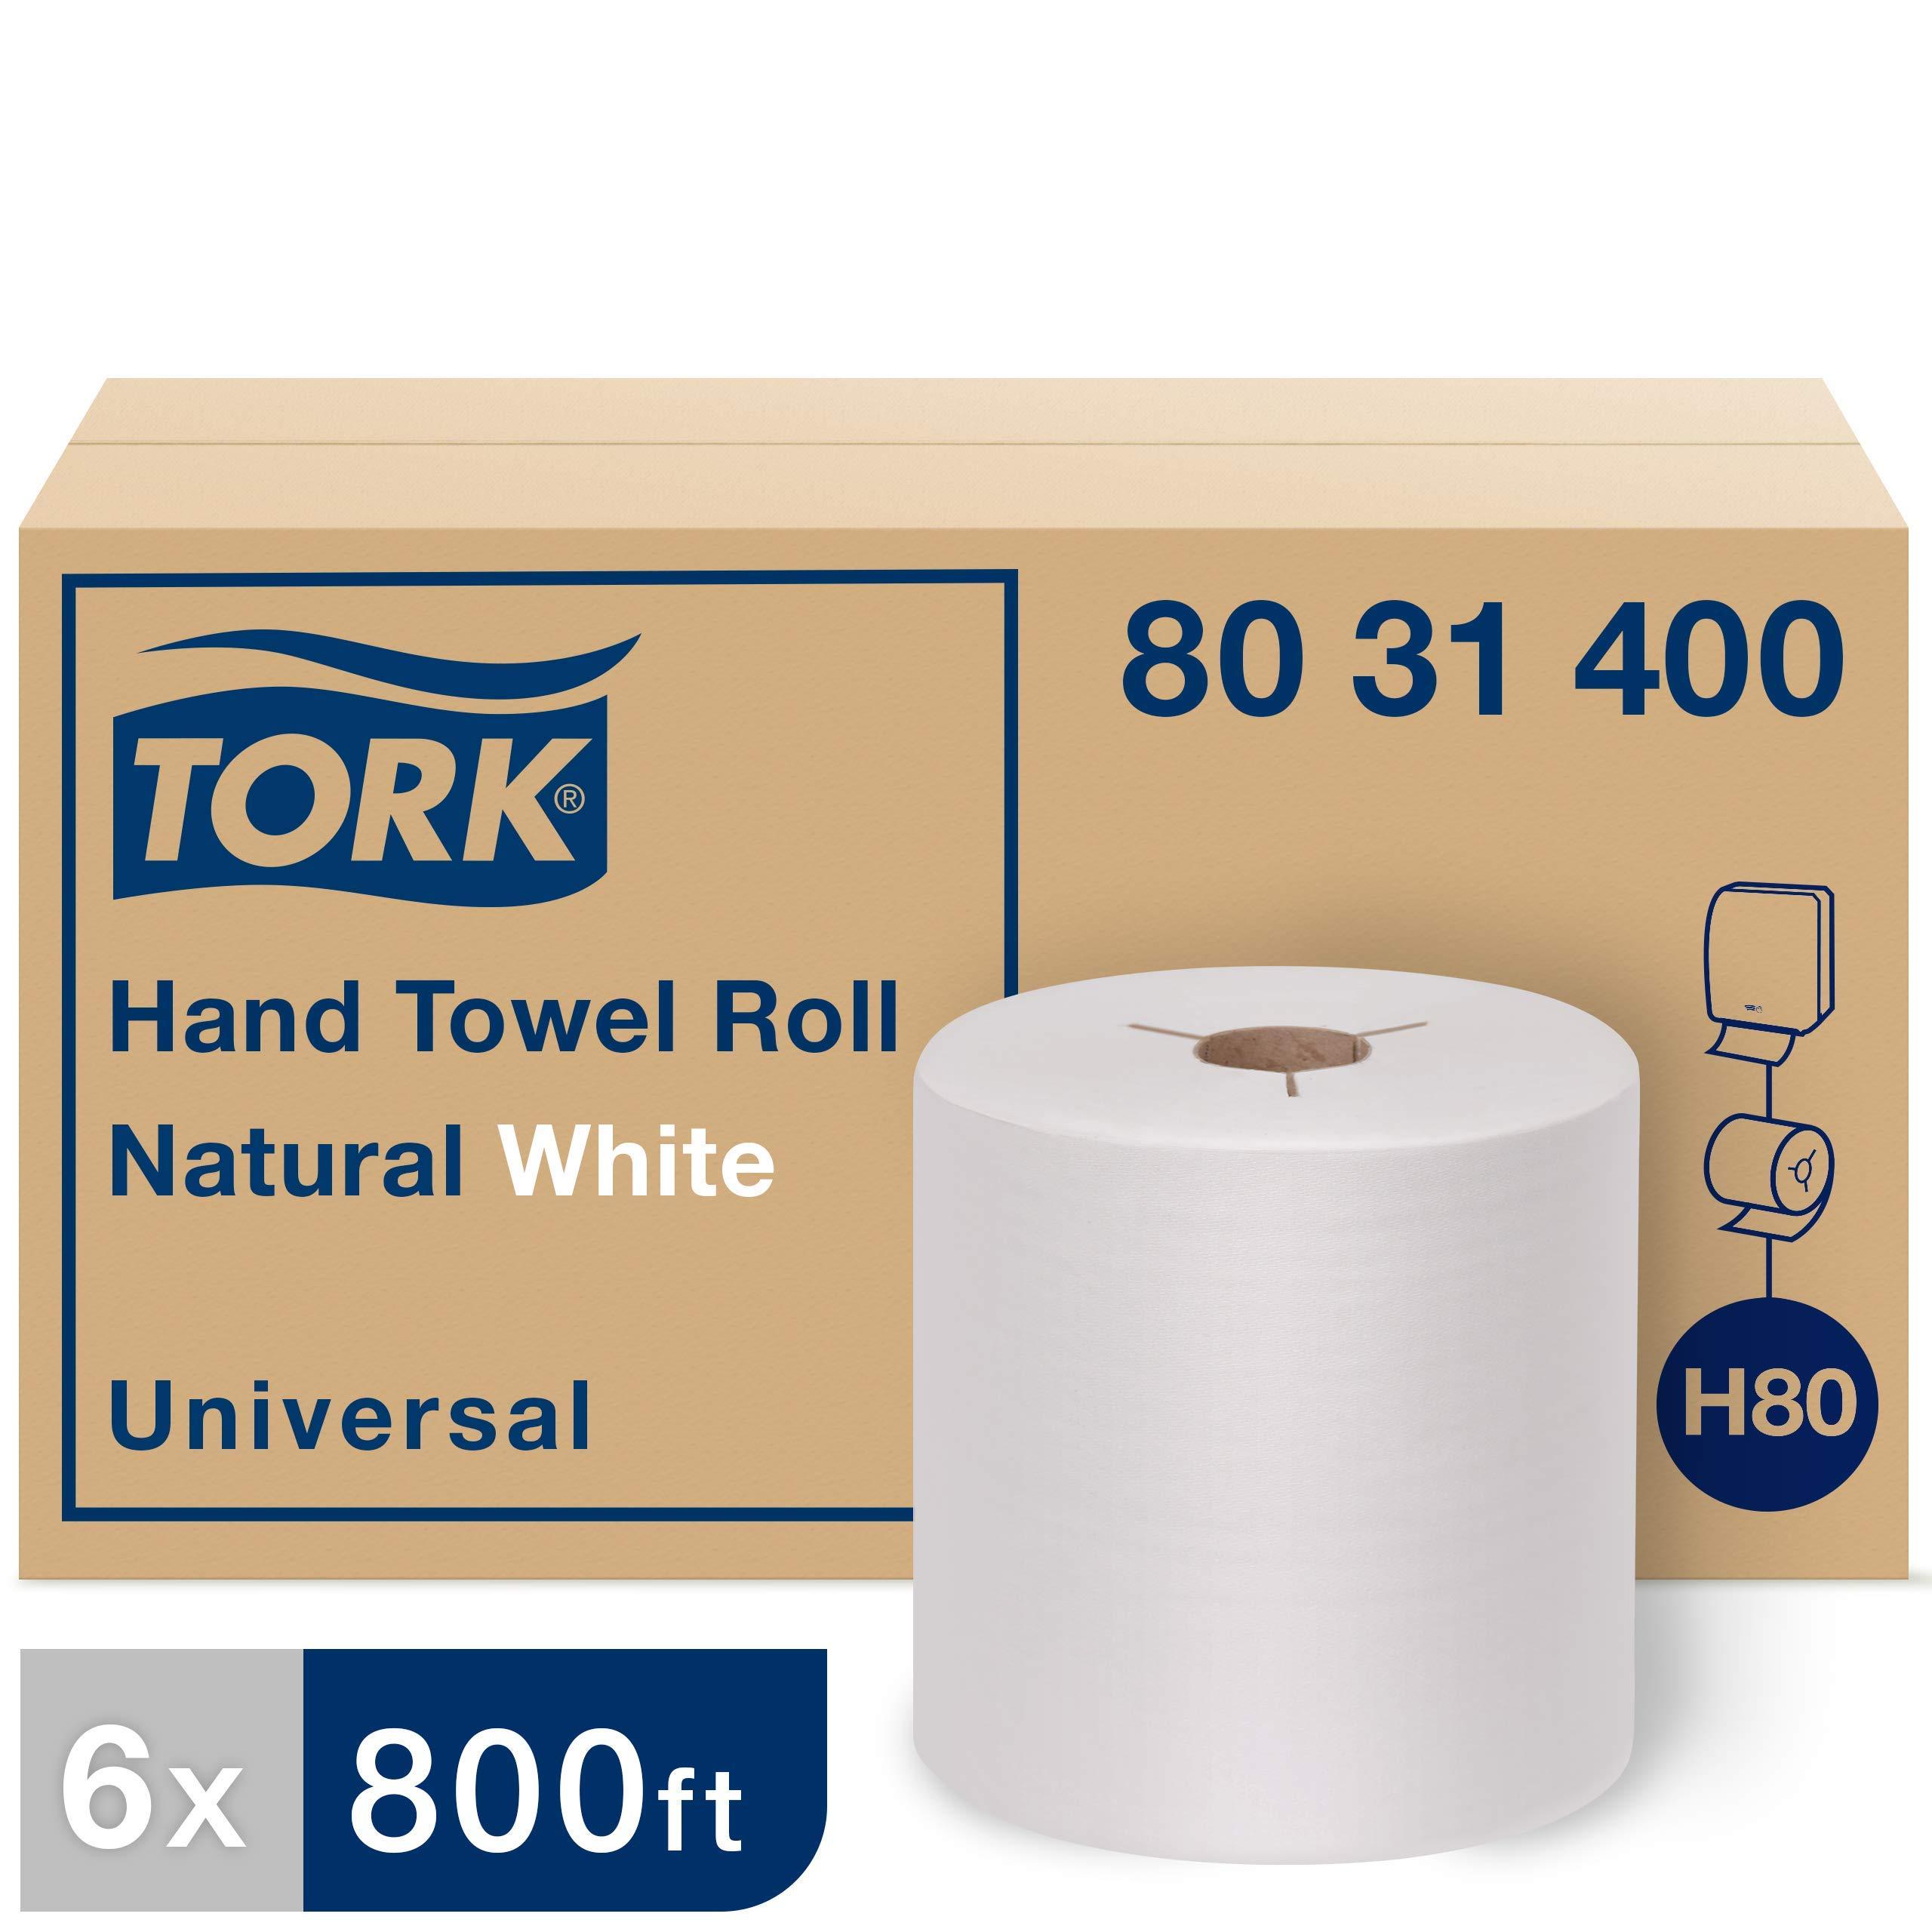 Tork 8031400 Universal Paper Hand Towel Roll, Y-Notch, 1-Ply, 8.0'' Width x 800' Length, White (Case of 6 Rolls, 800 Feet per Roll, 4,800 Feet per Case)